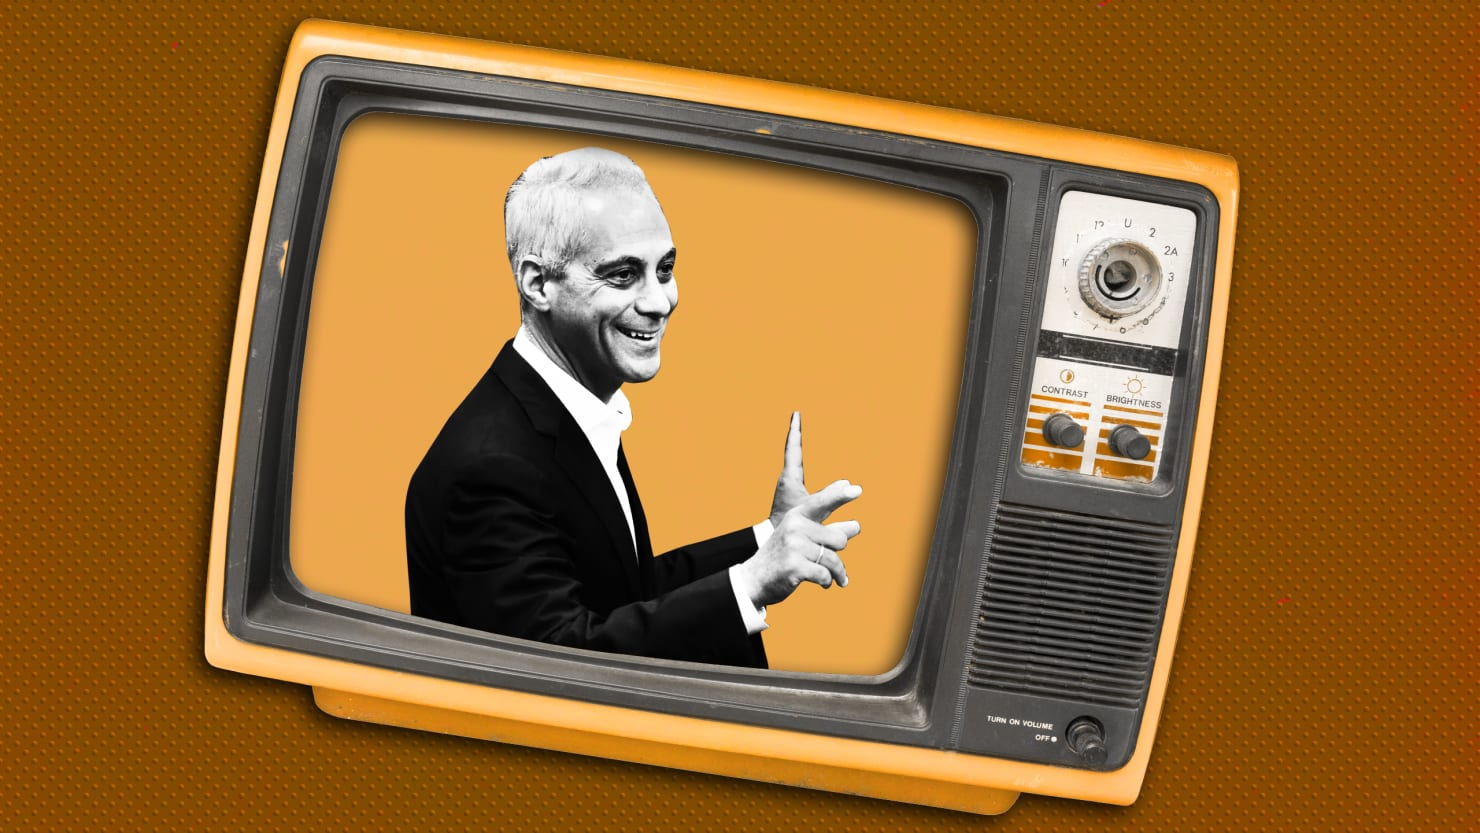 thedailybeast.com - Maxwell Tani - Rahm Emanuel Shops Around for TV Pundit Gig